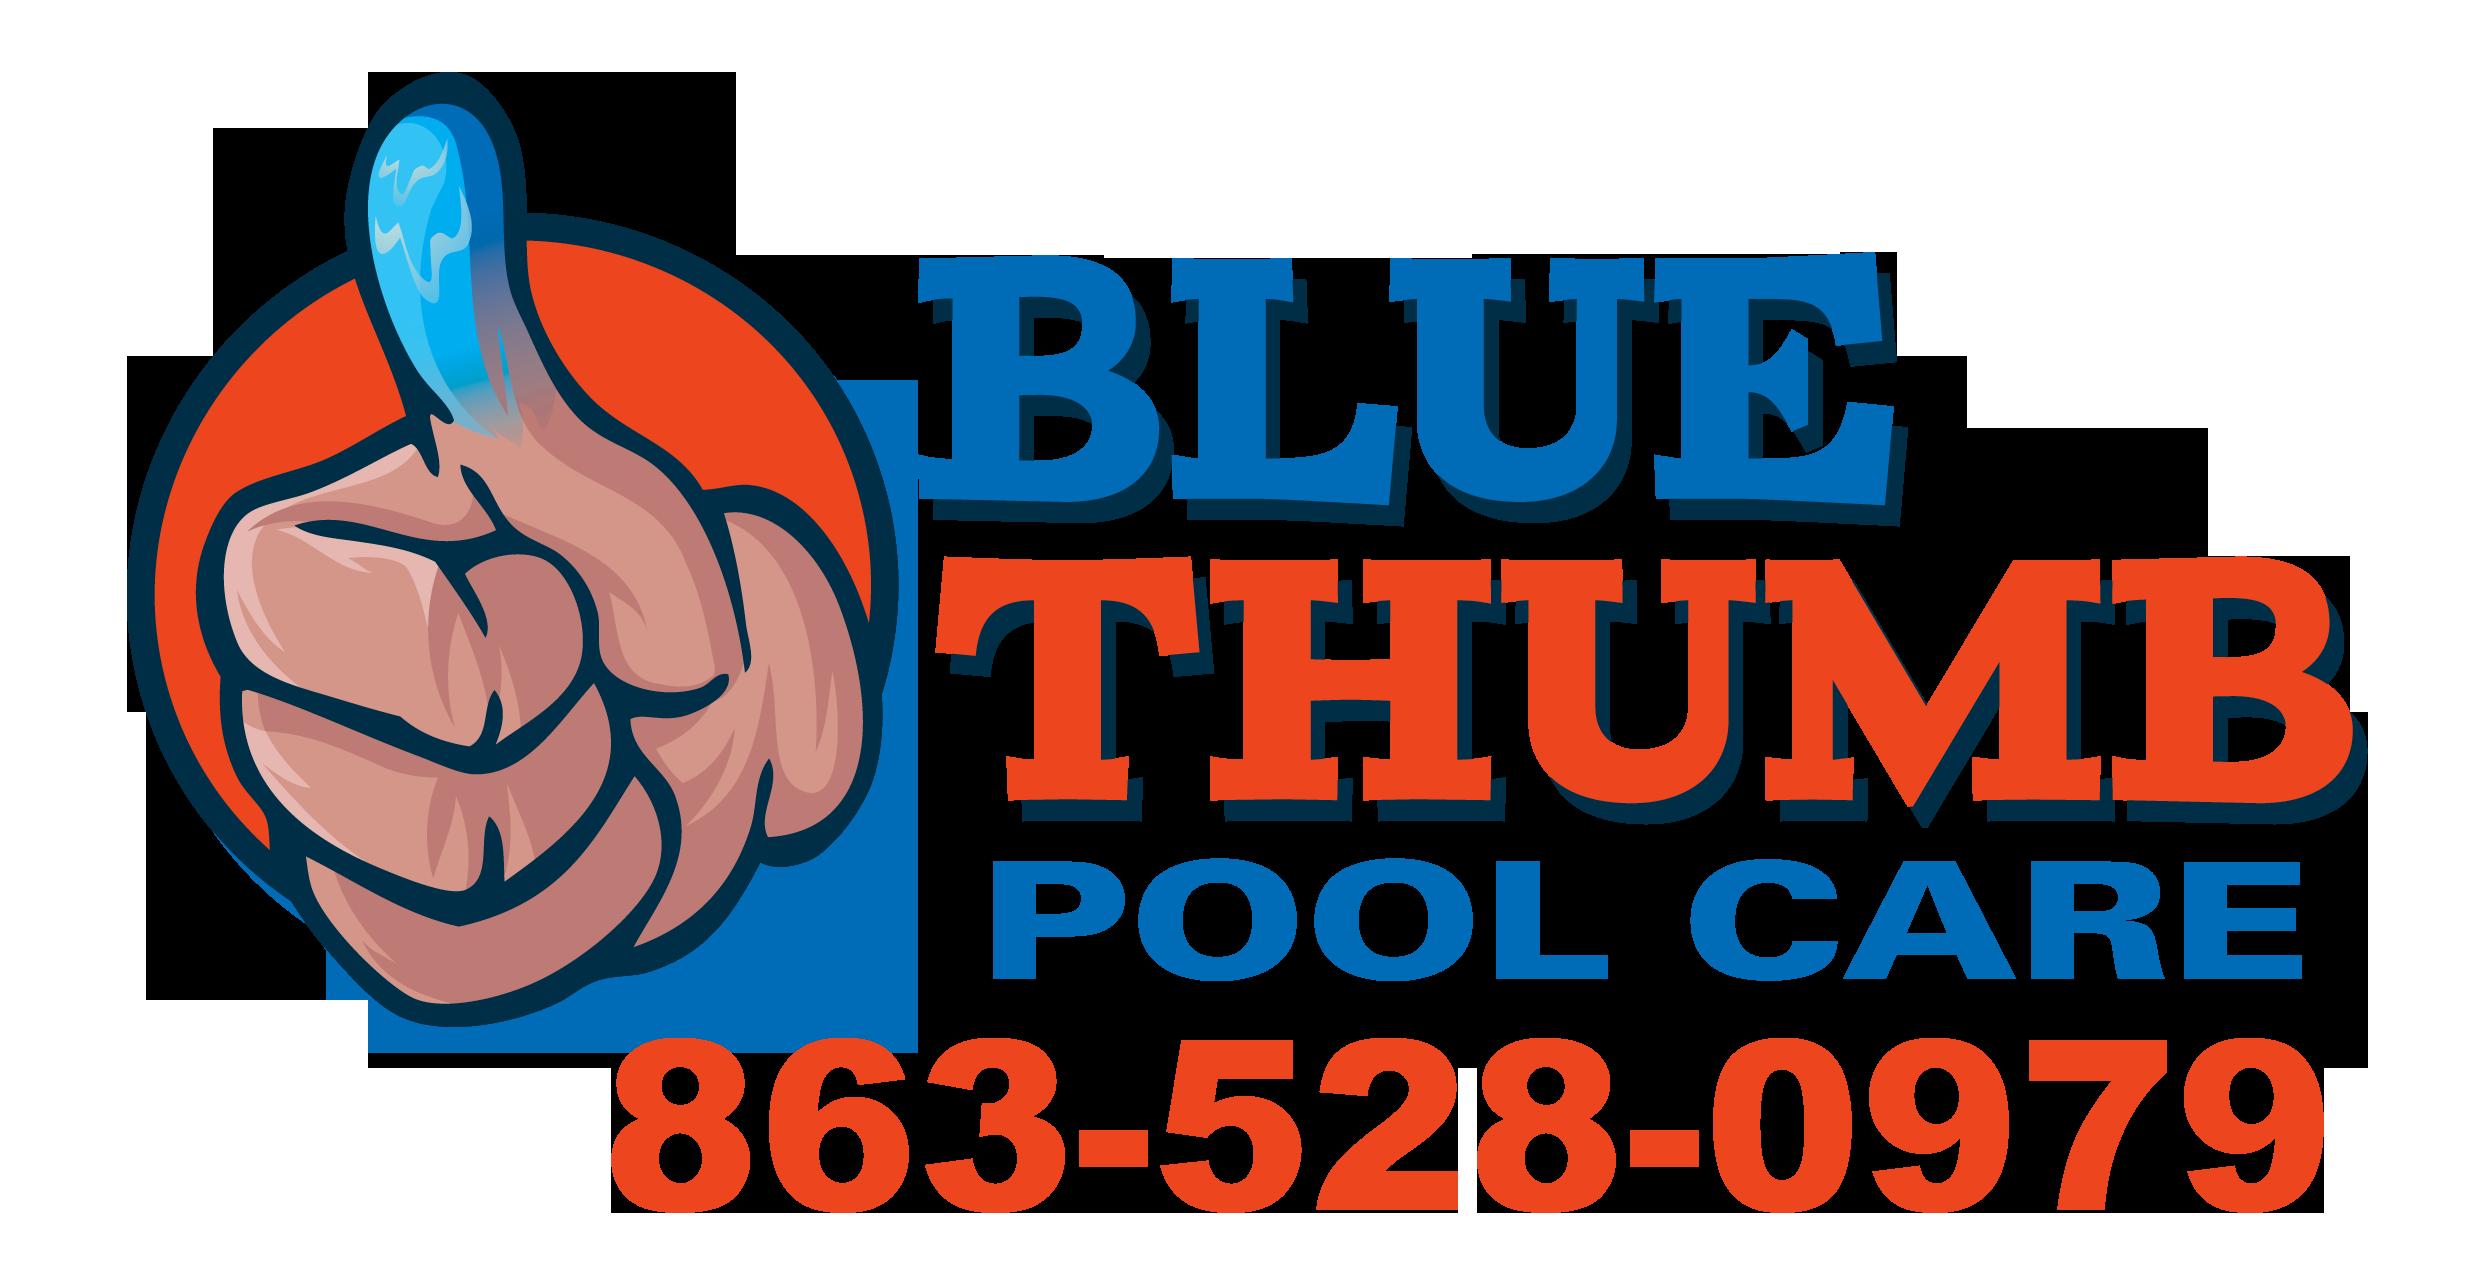 bluethumwidephone